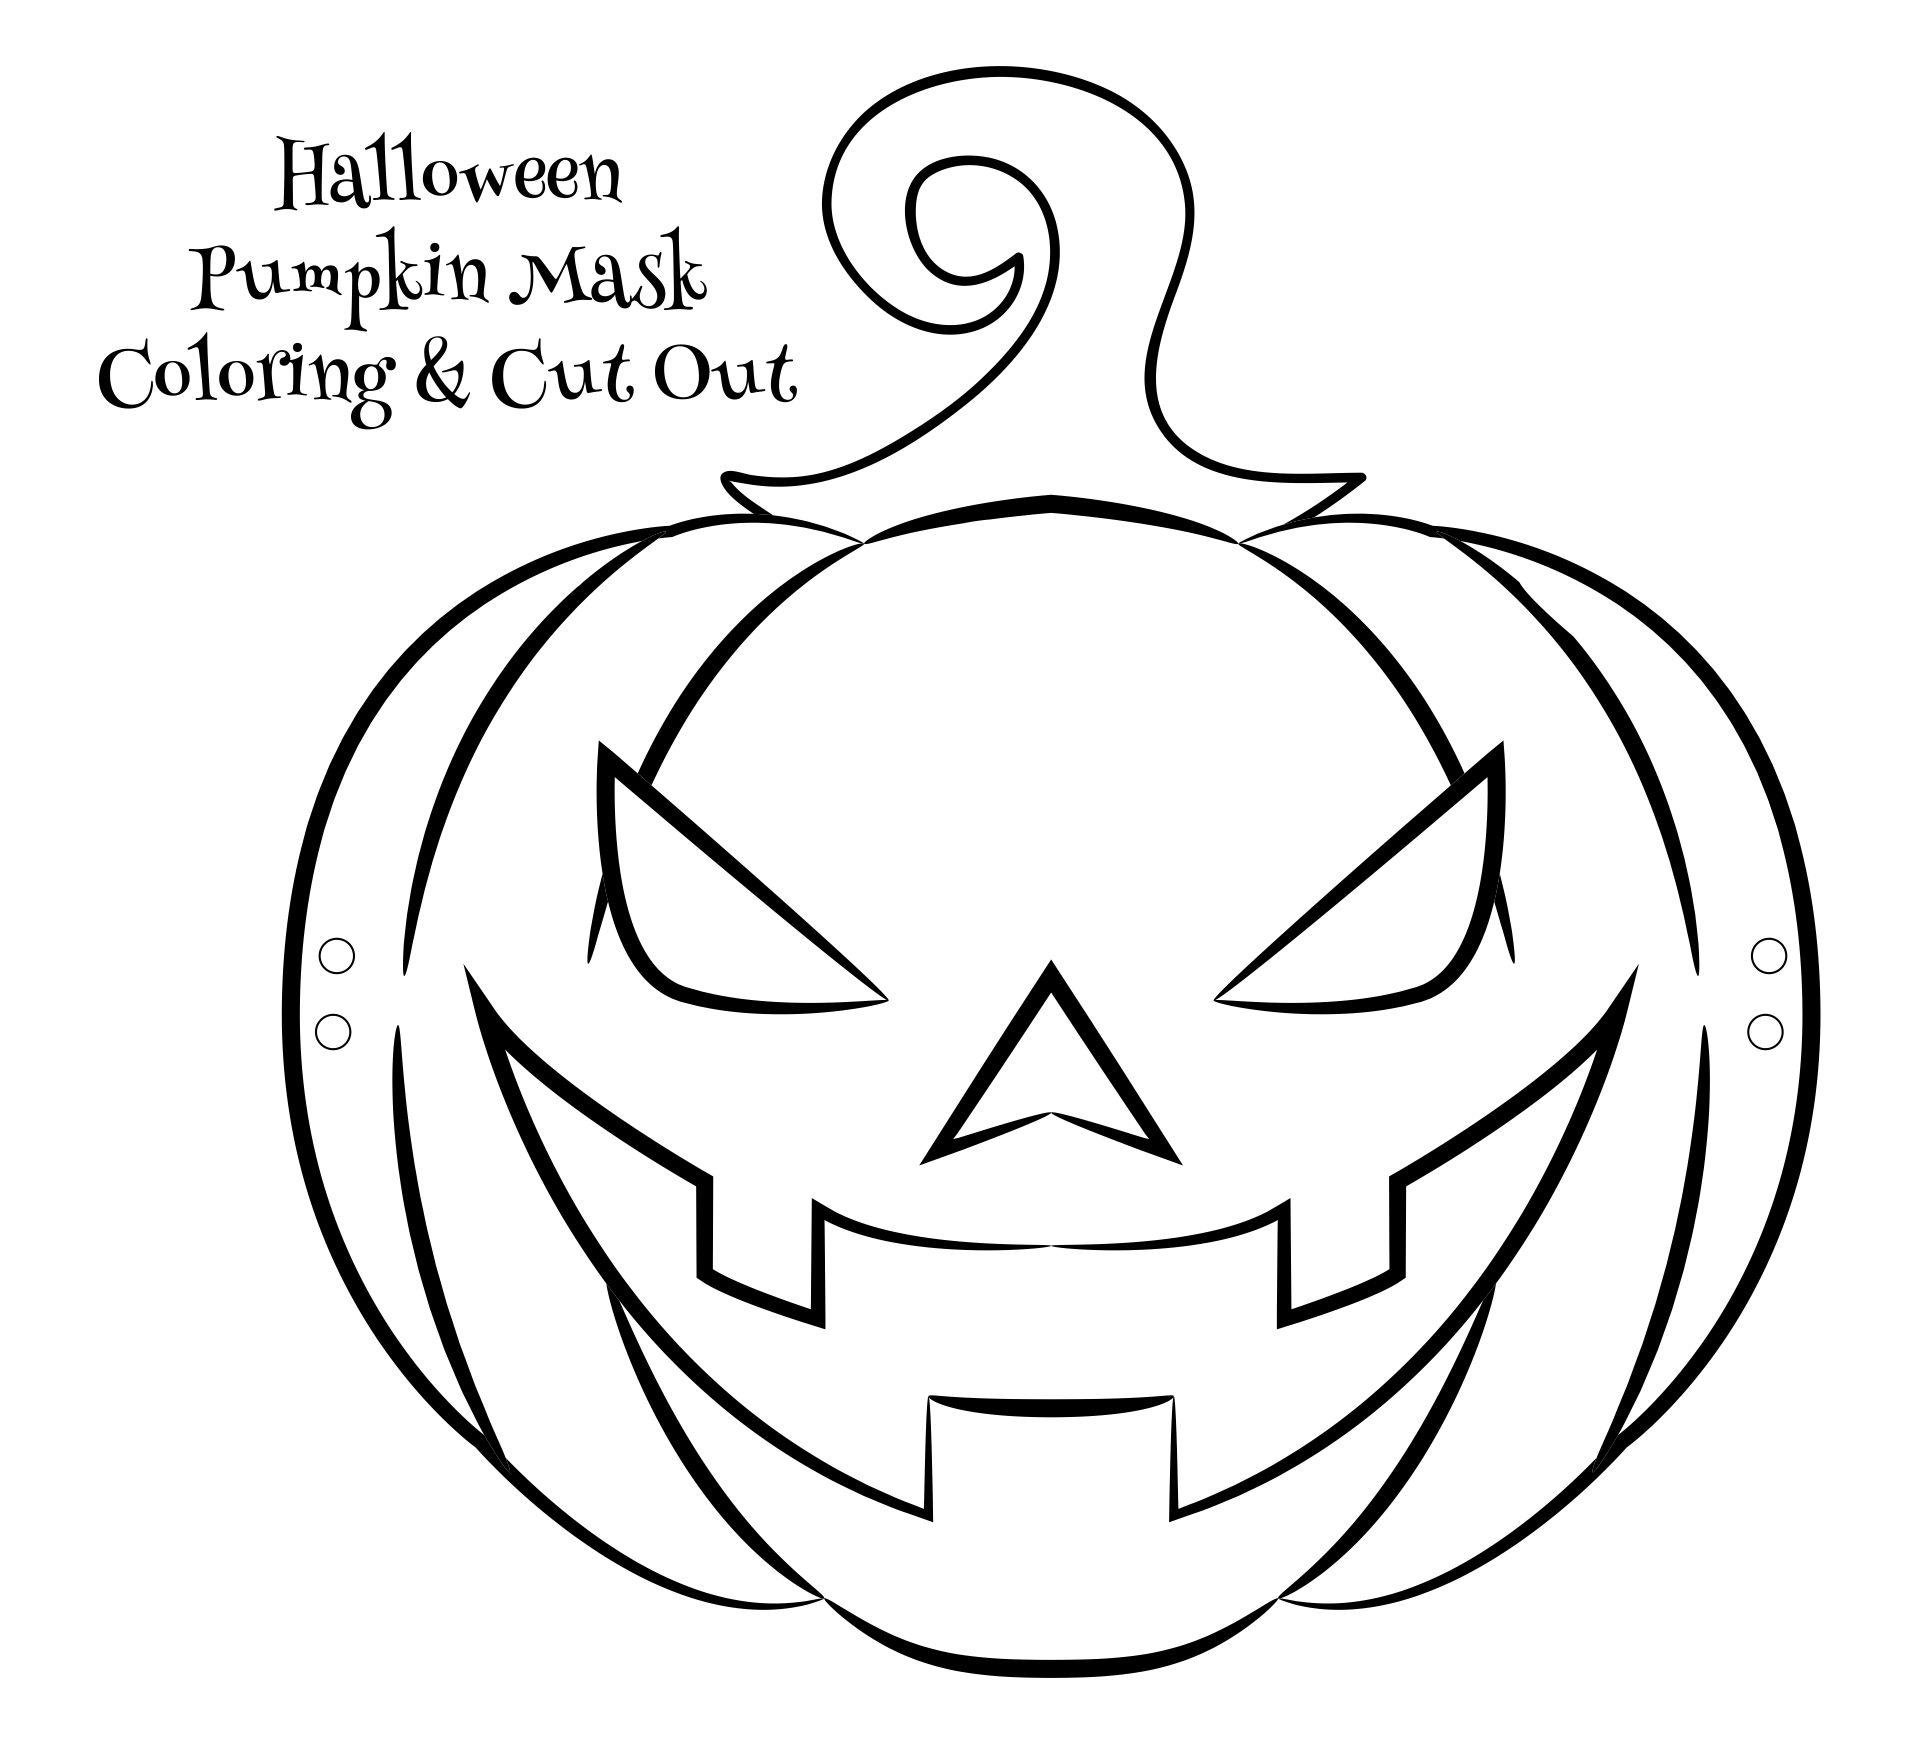 Halloween Pumpkin Arts and Crafts